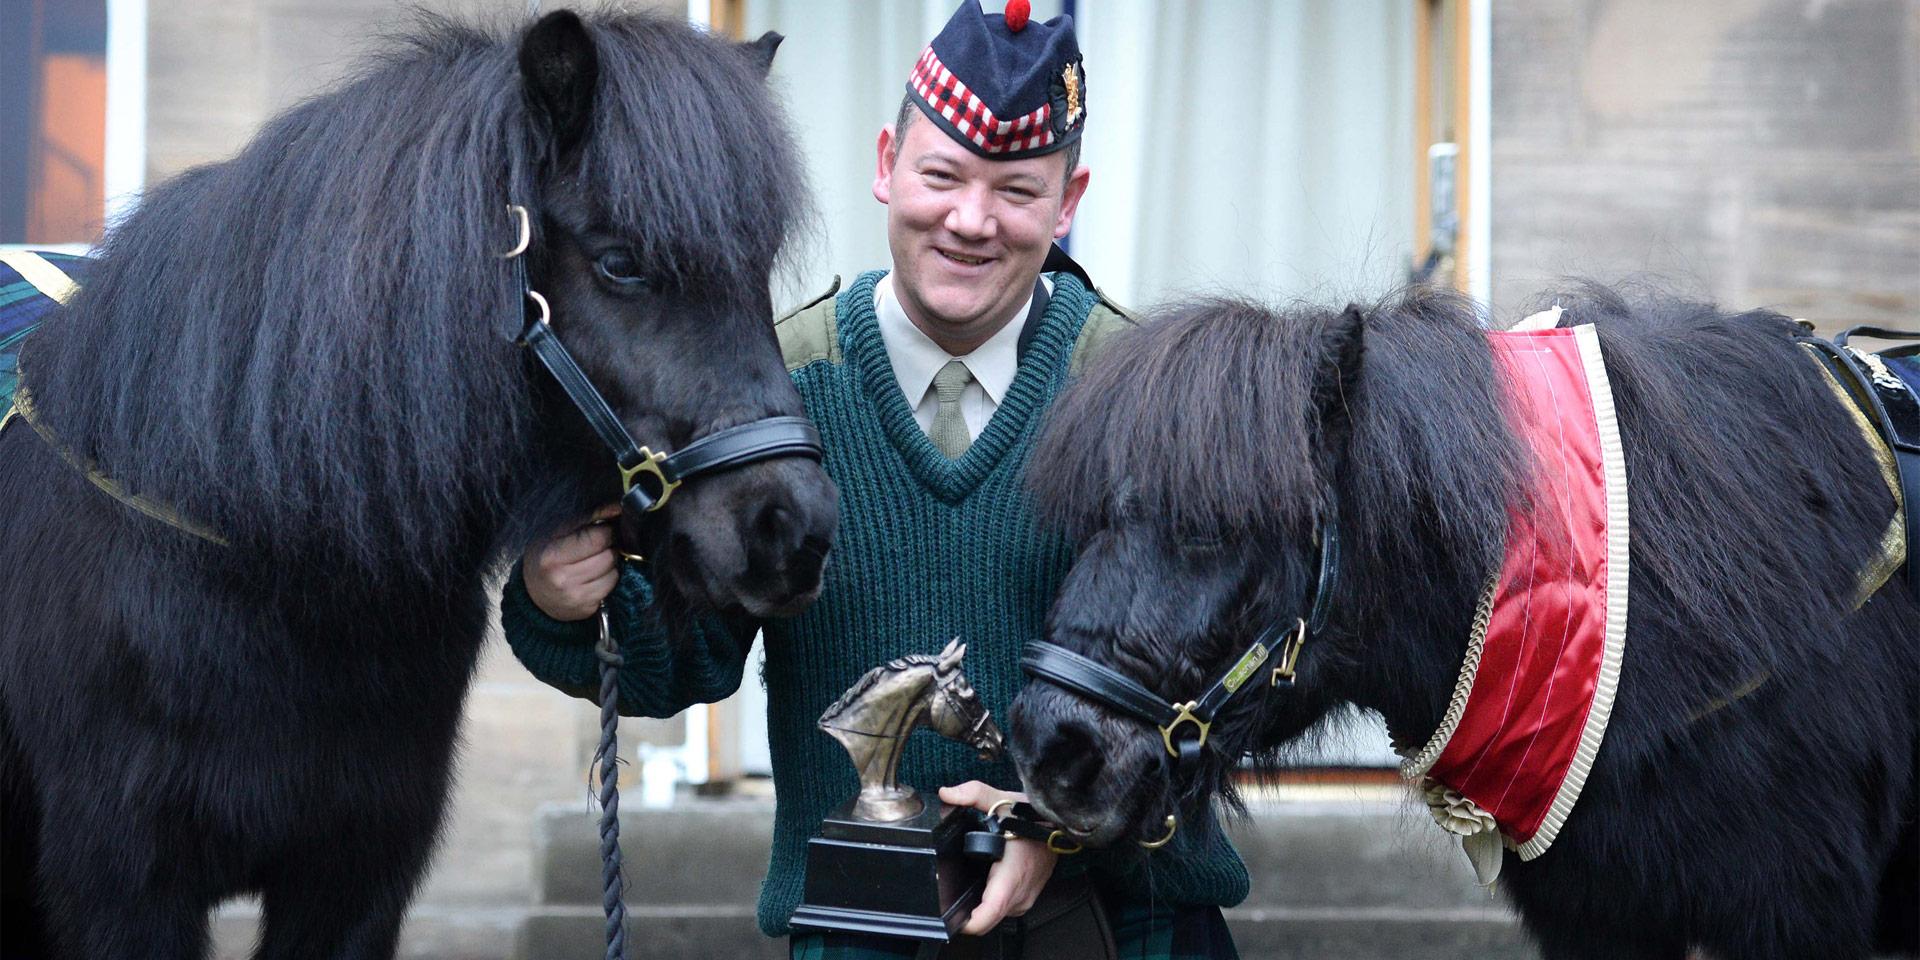 Pony Major Corporal Mark Wilkinson with Cruachan III, and Cruachan IV, his successor as regimental mascot of the Royal Regiment of Scotland, Edinburgh, 2015